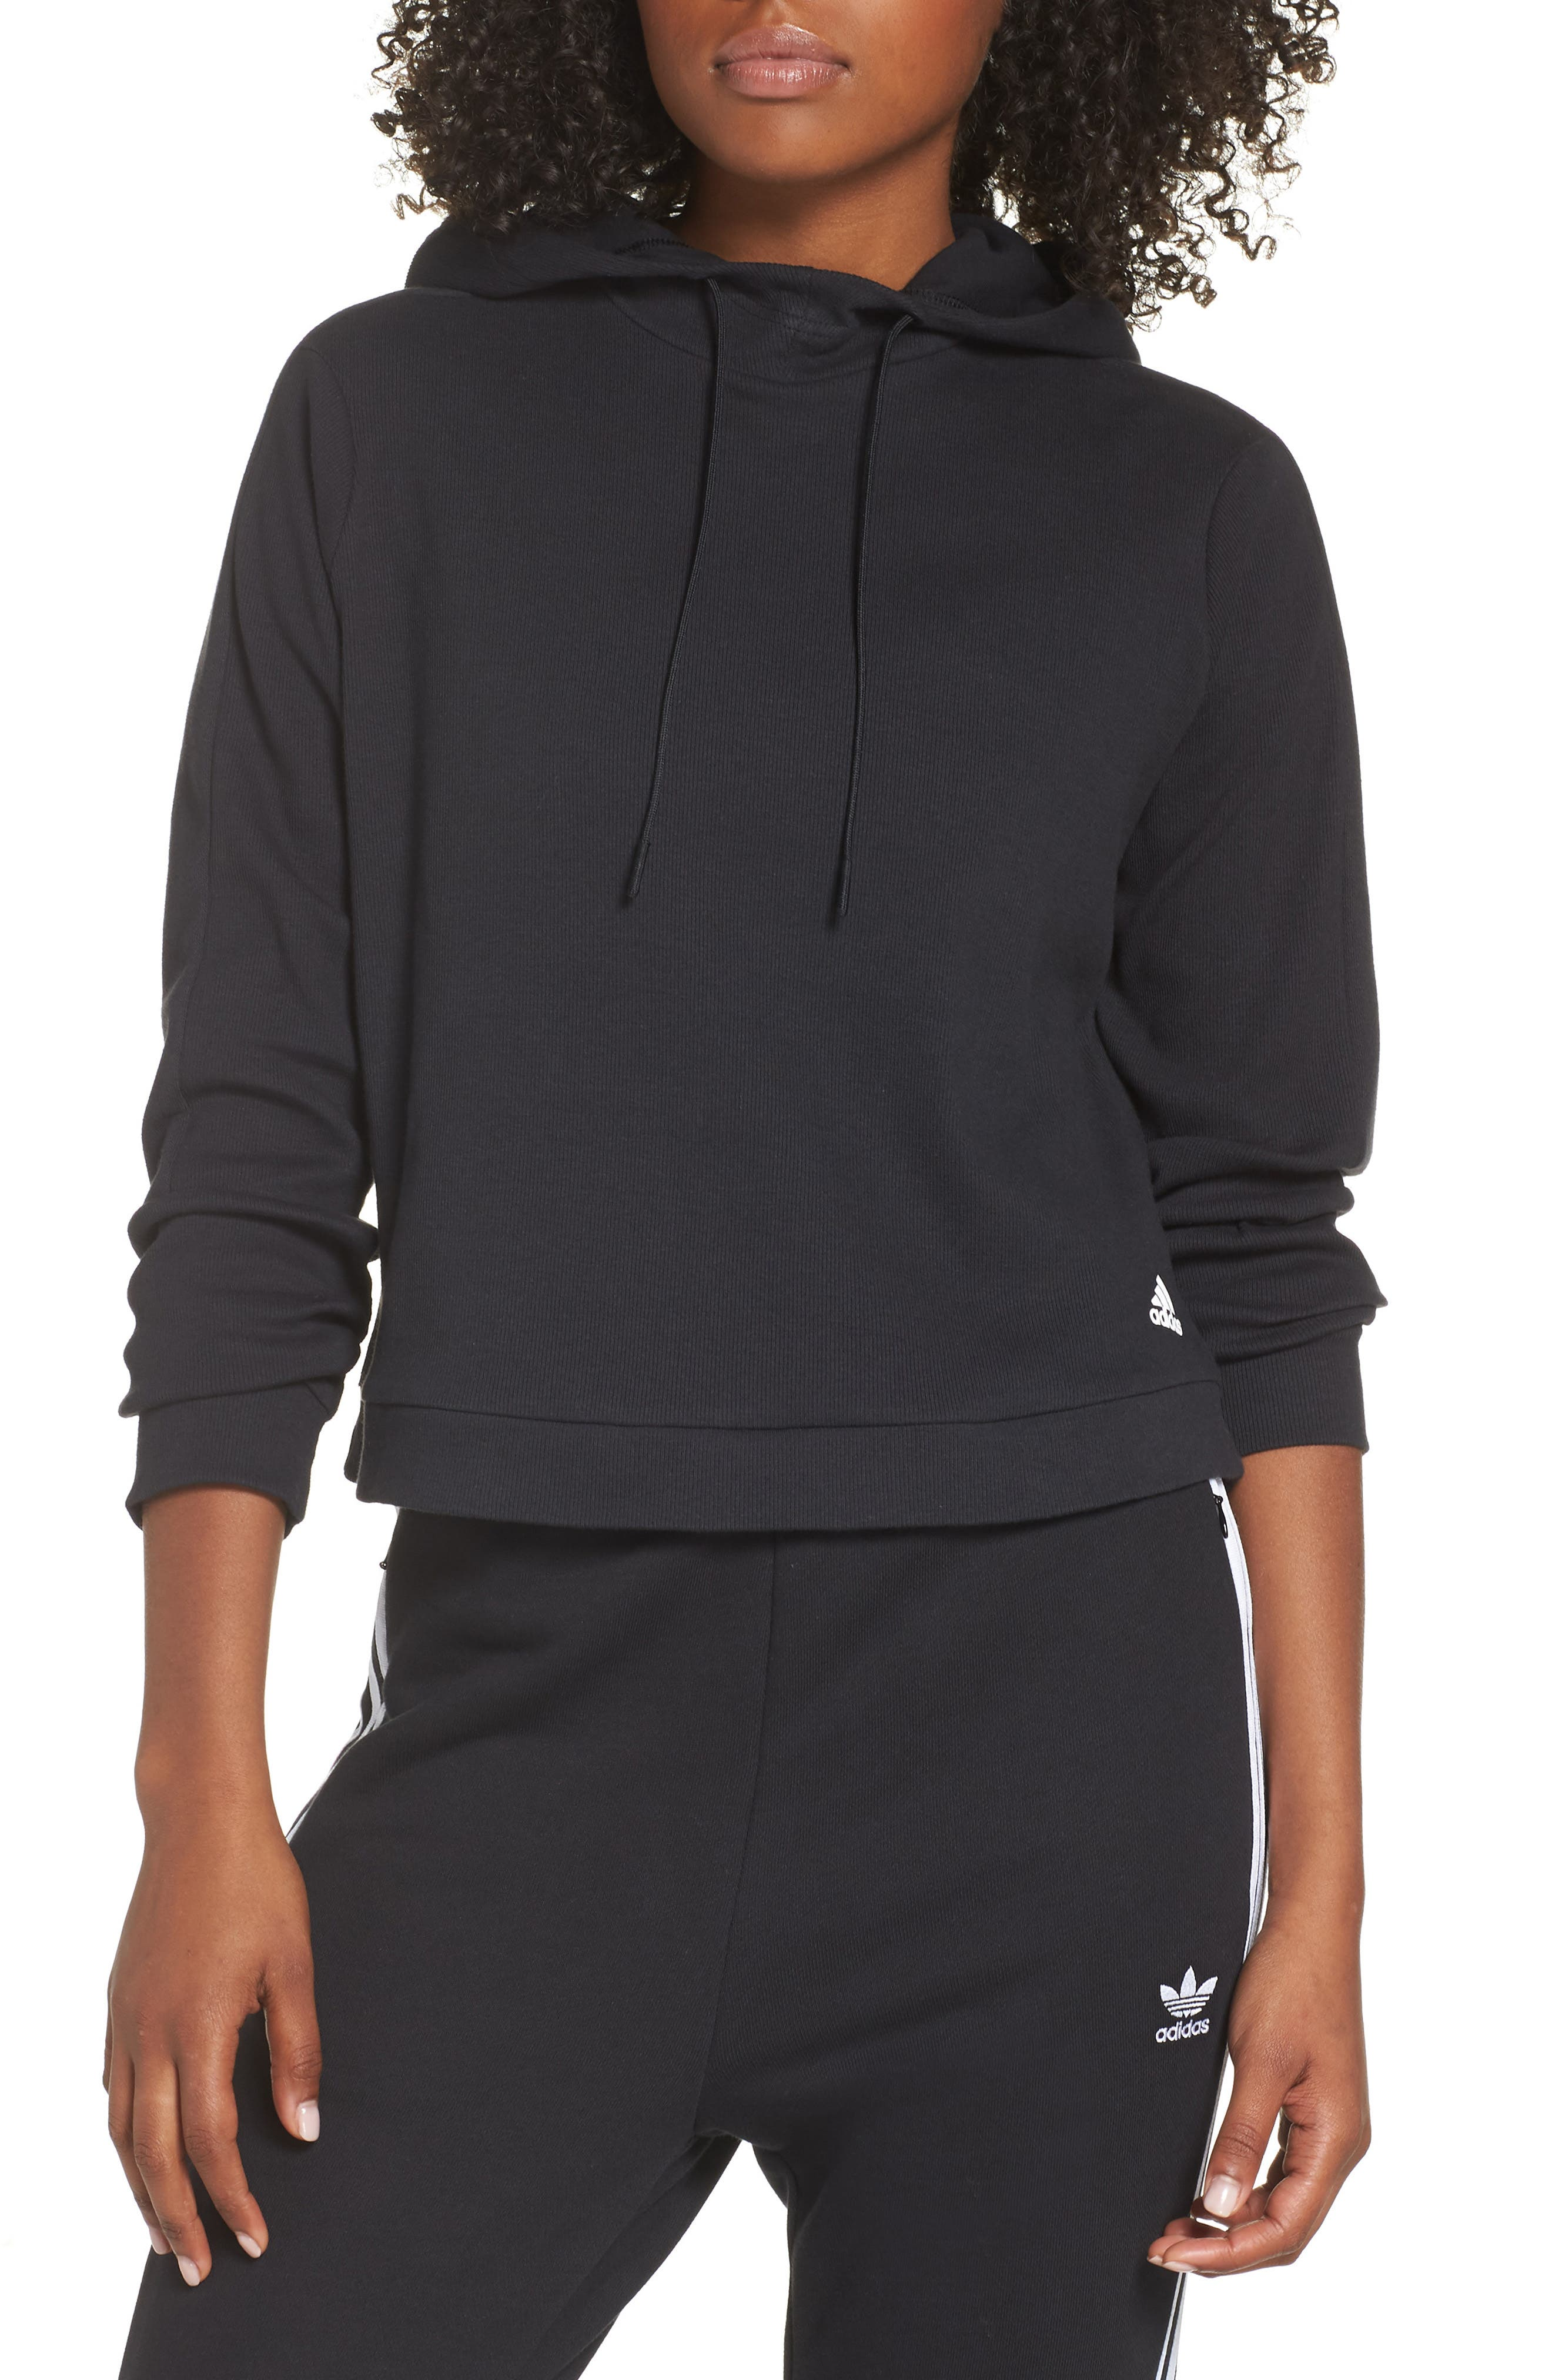 Adidas Id Q4 High/low Pullover Hoodie, Black